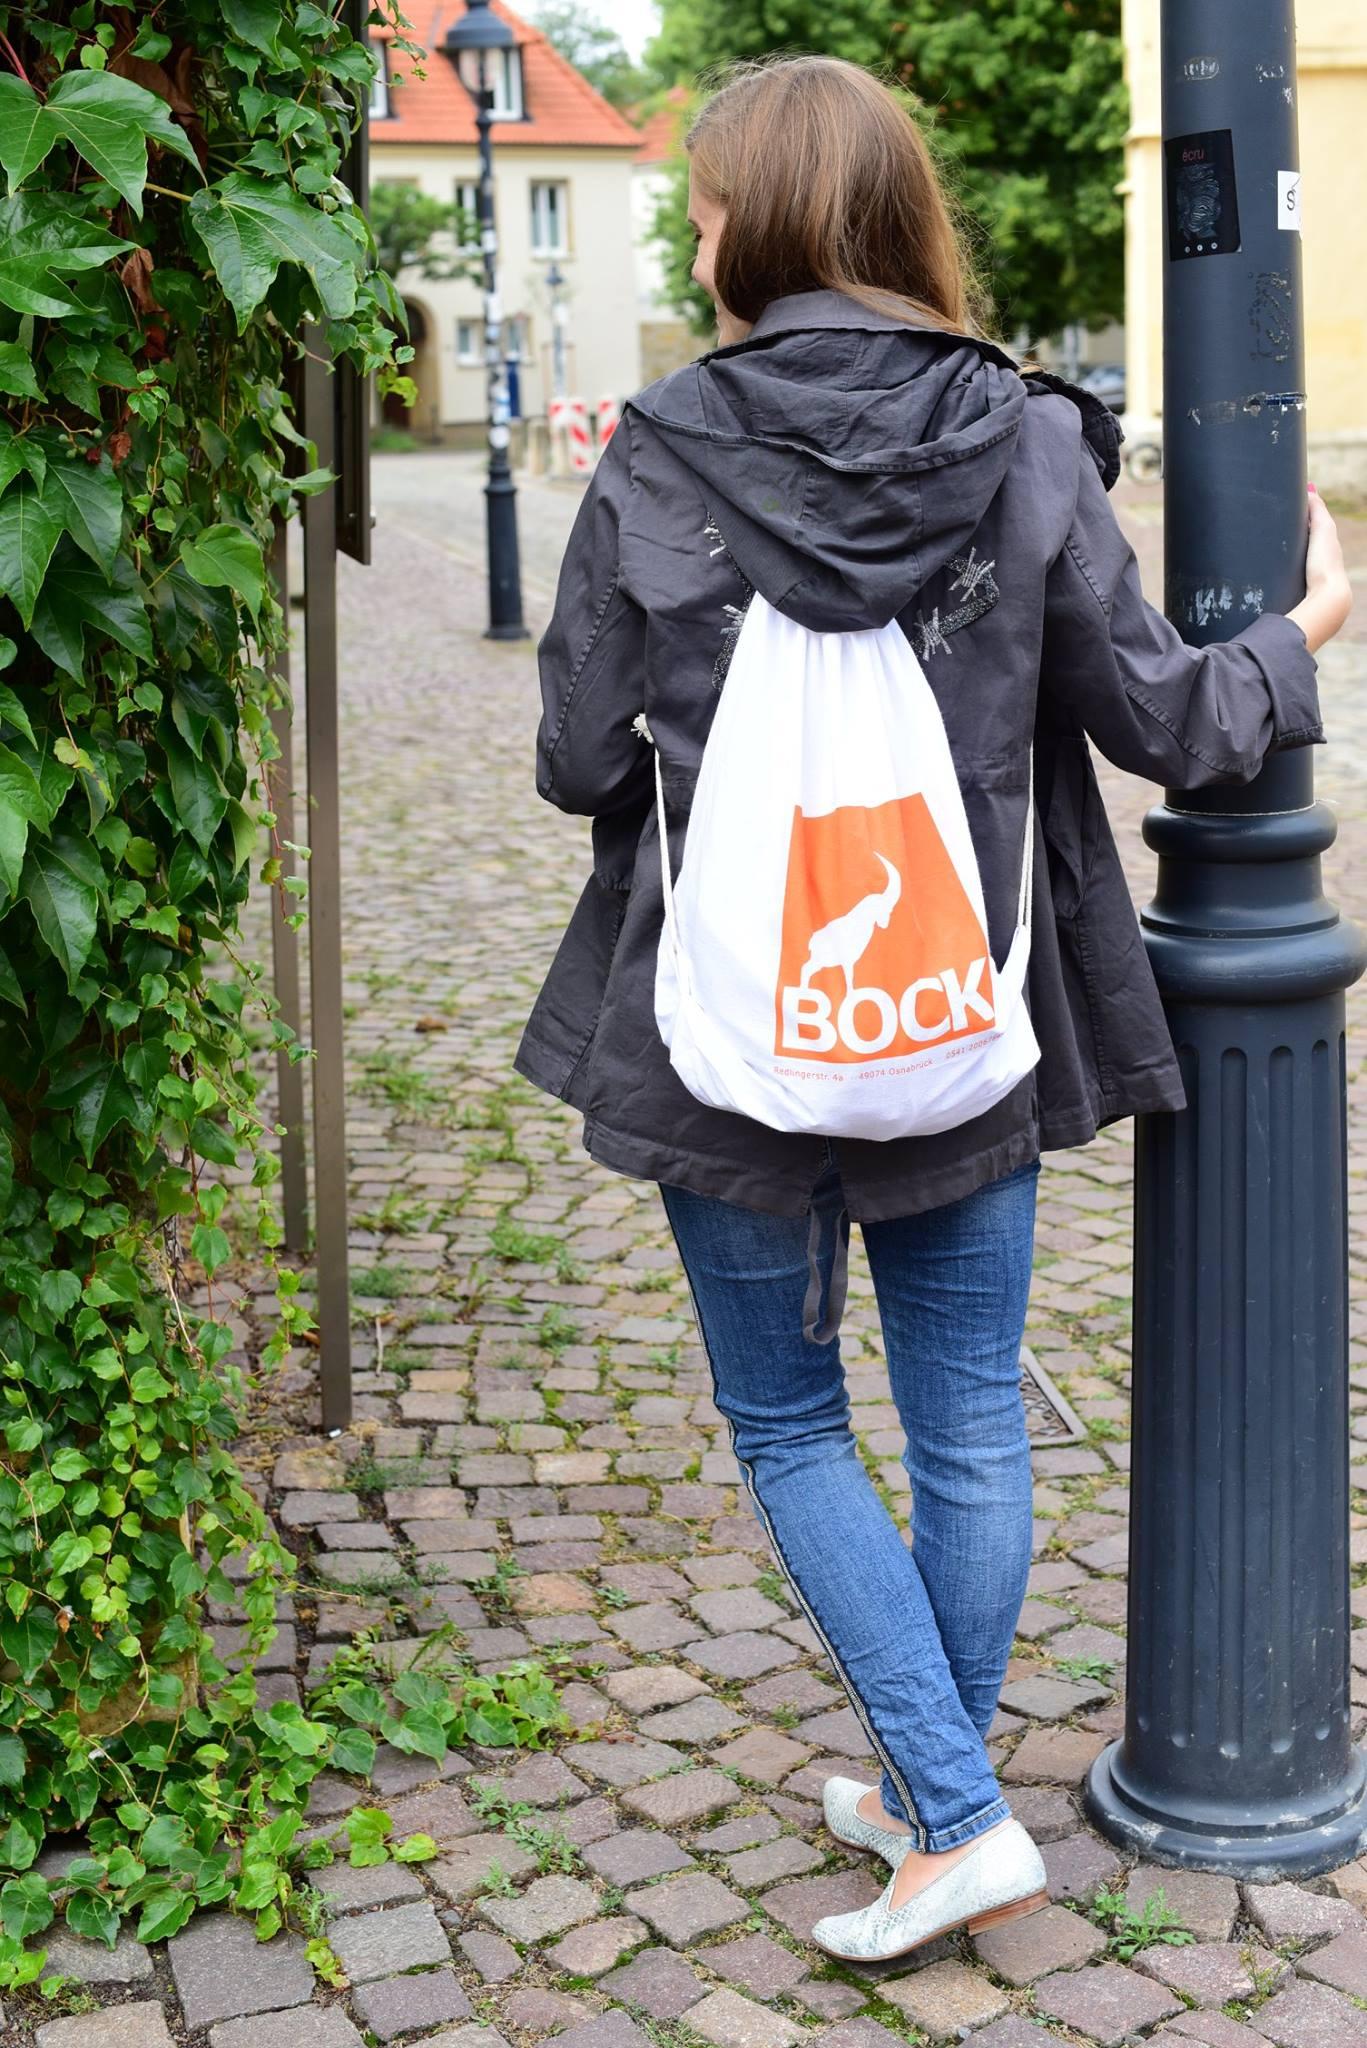 bock_bags_osnabrueck_1.jpg